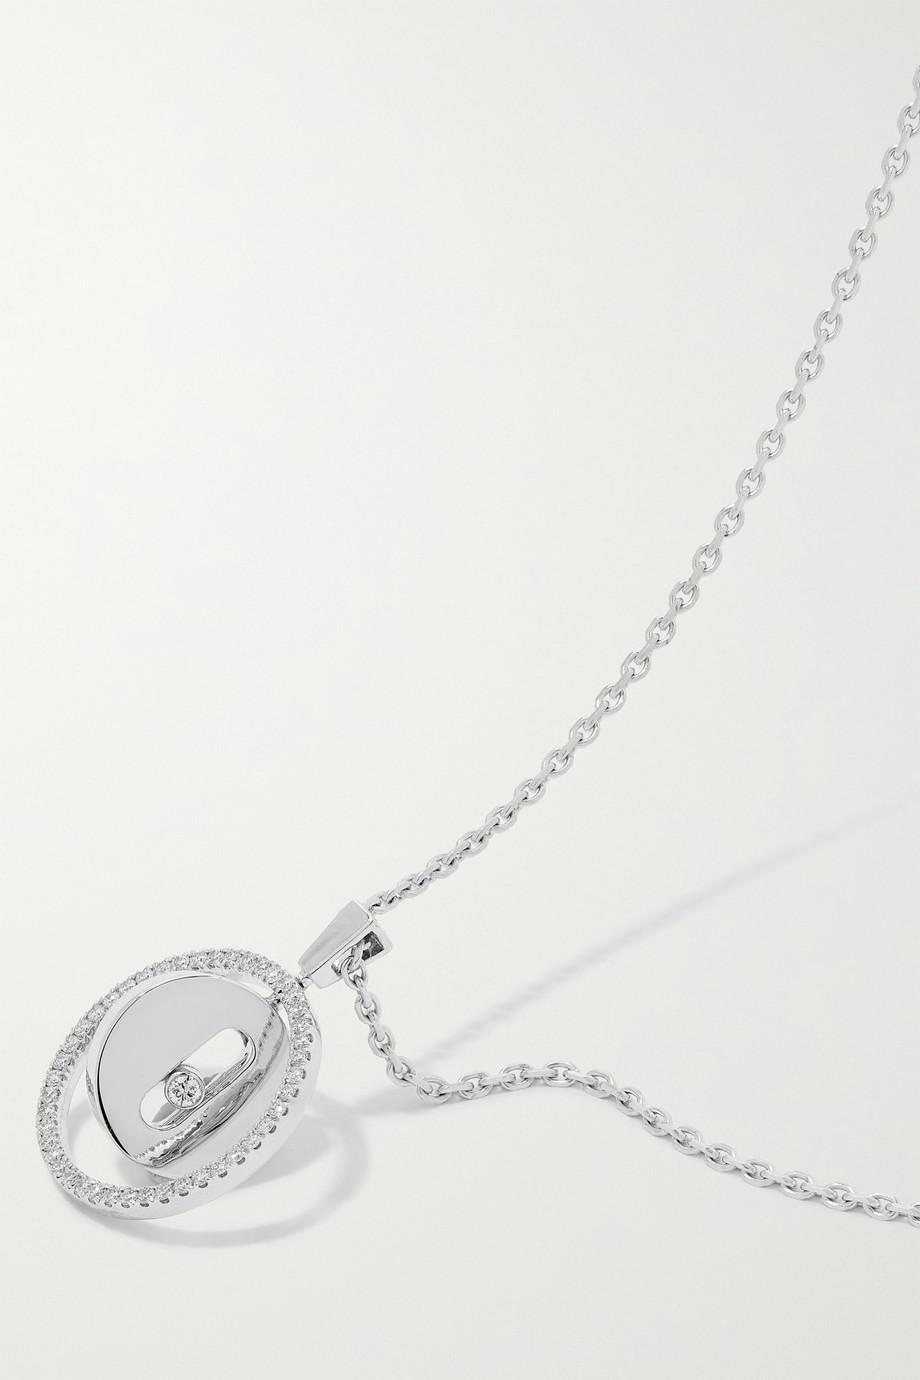 Messika Lucky Move 18-karat white gold diamond necklace